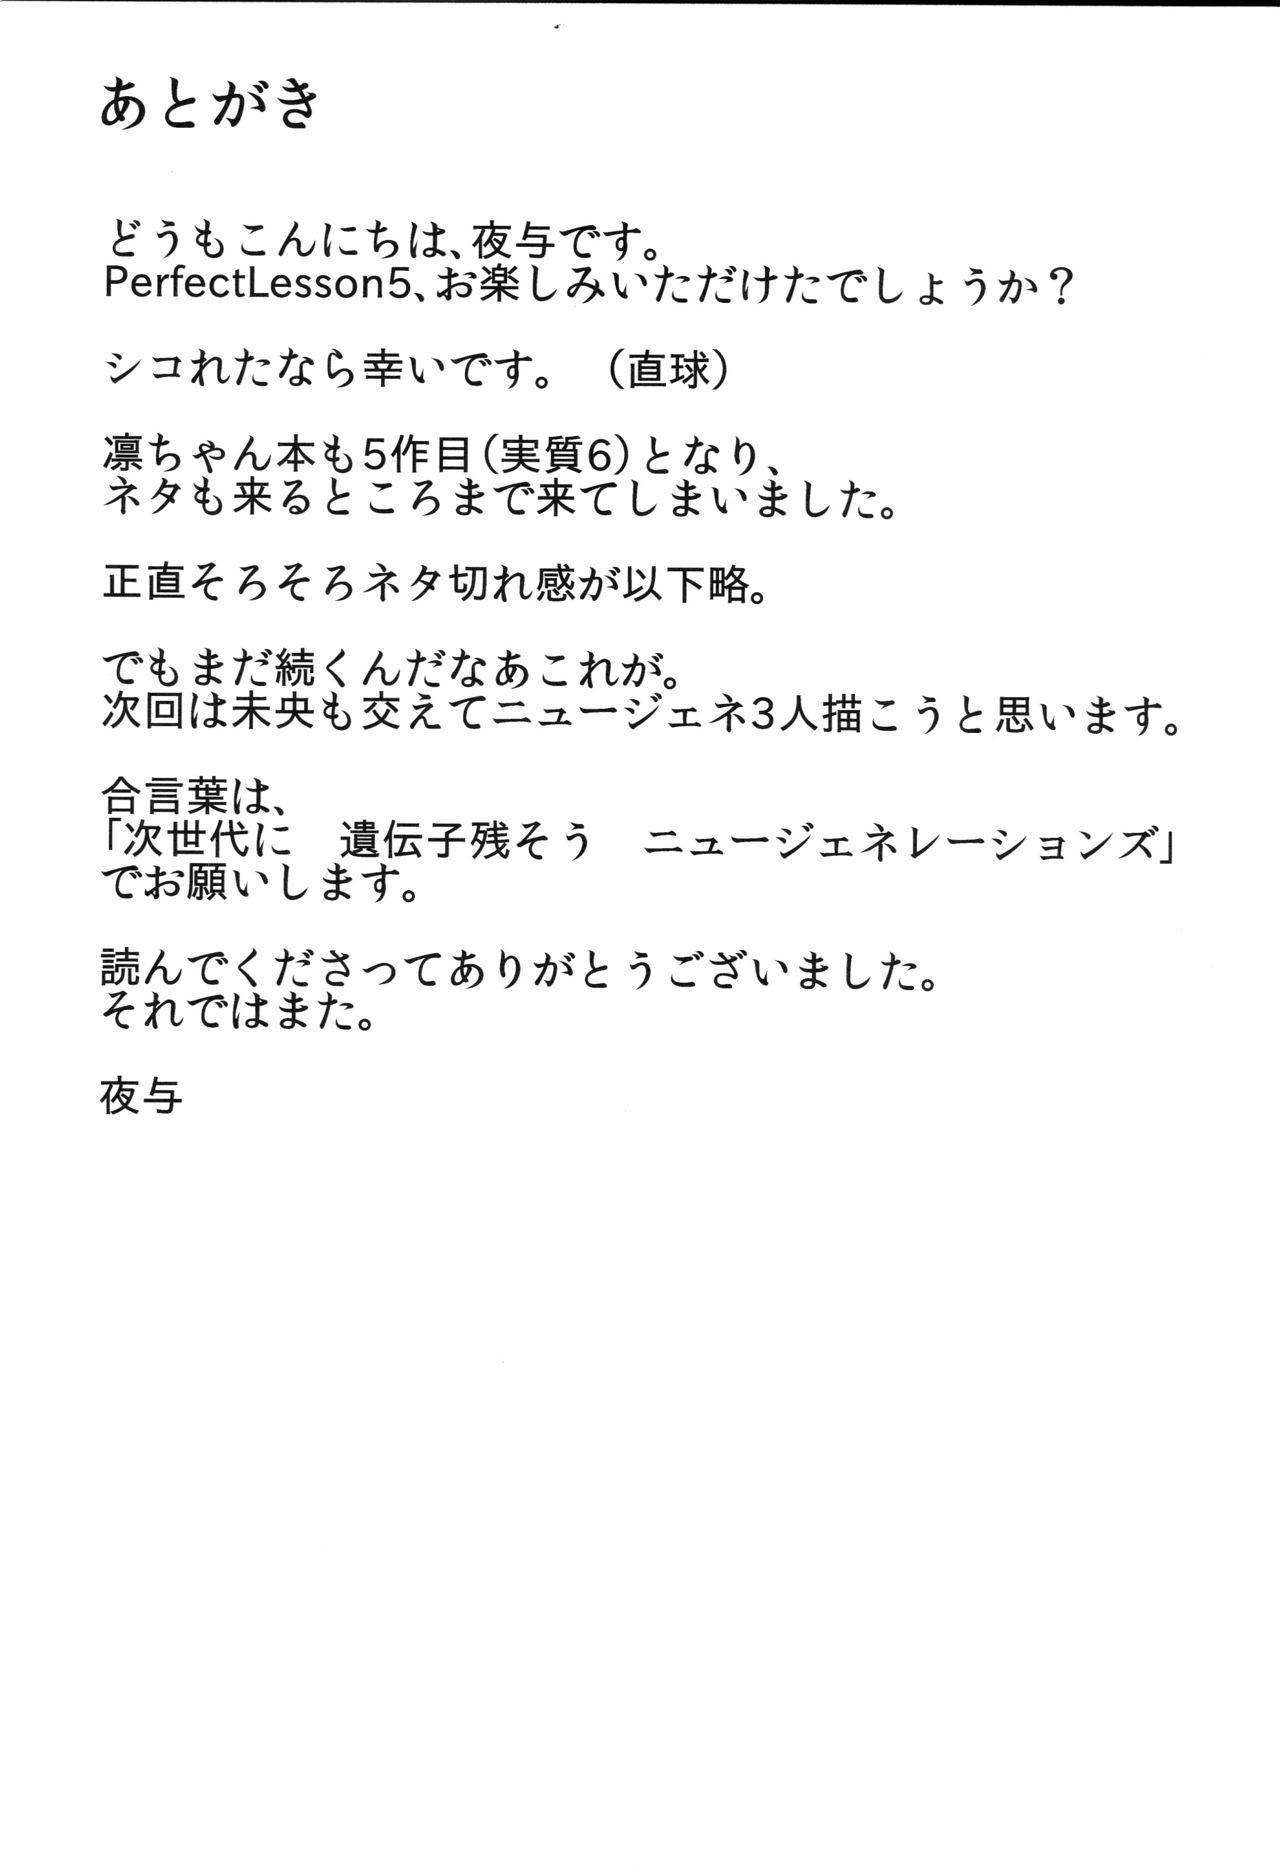 Perfect Lesson 5 Idol Haisetsu Stage 25